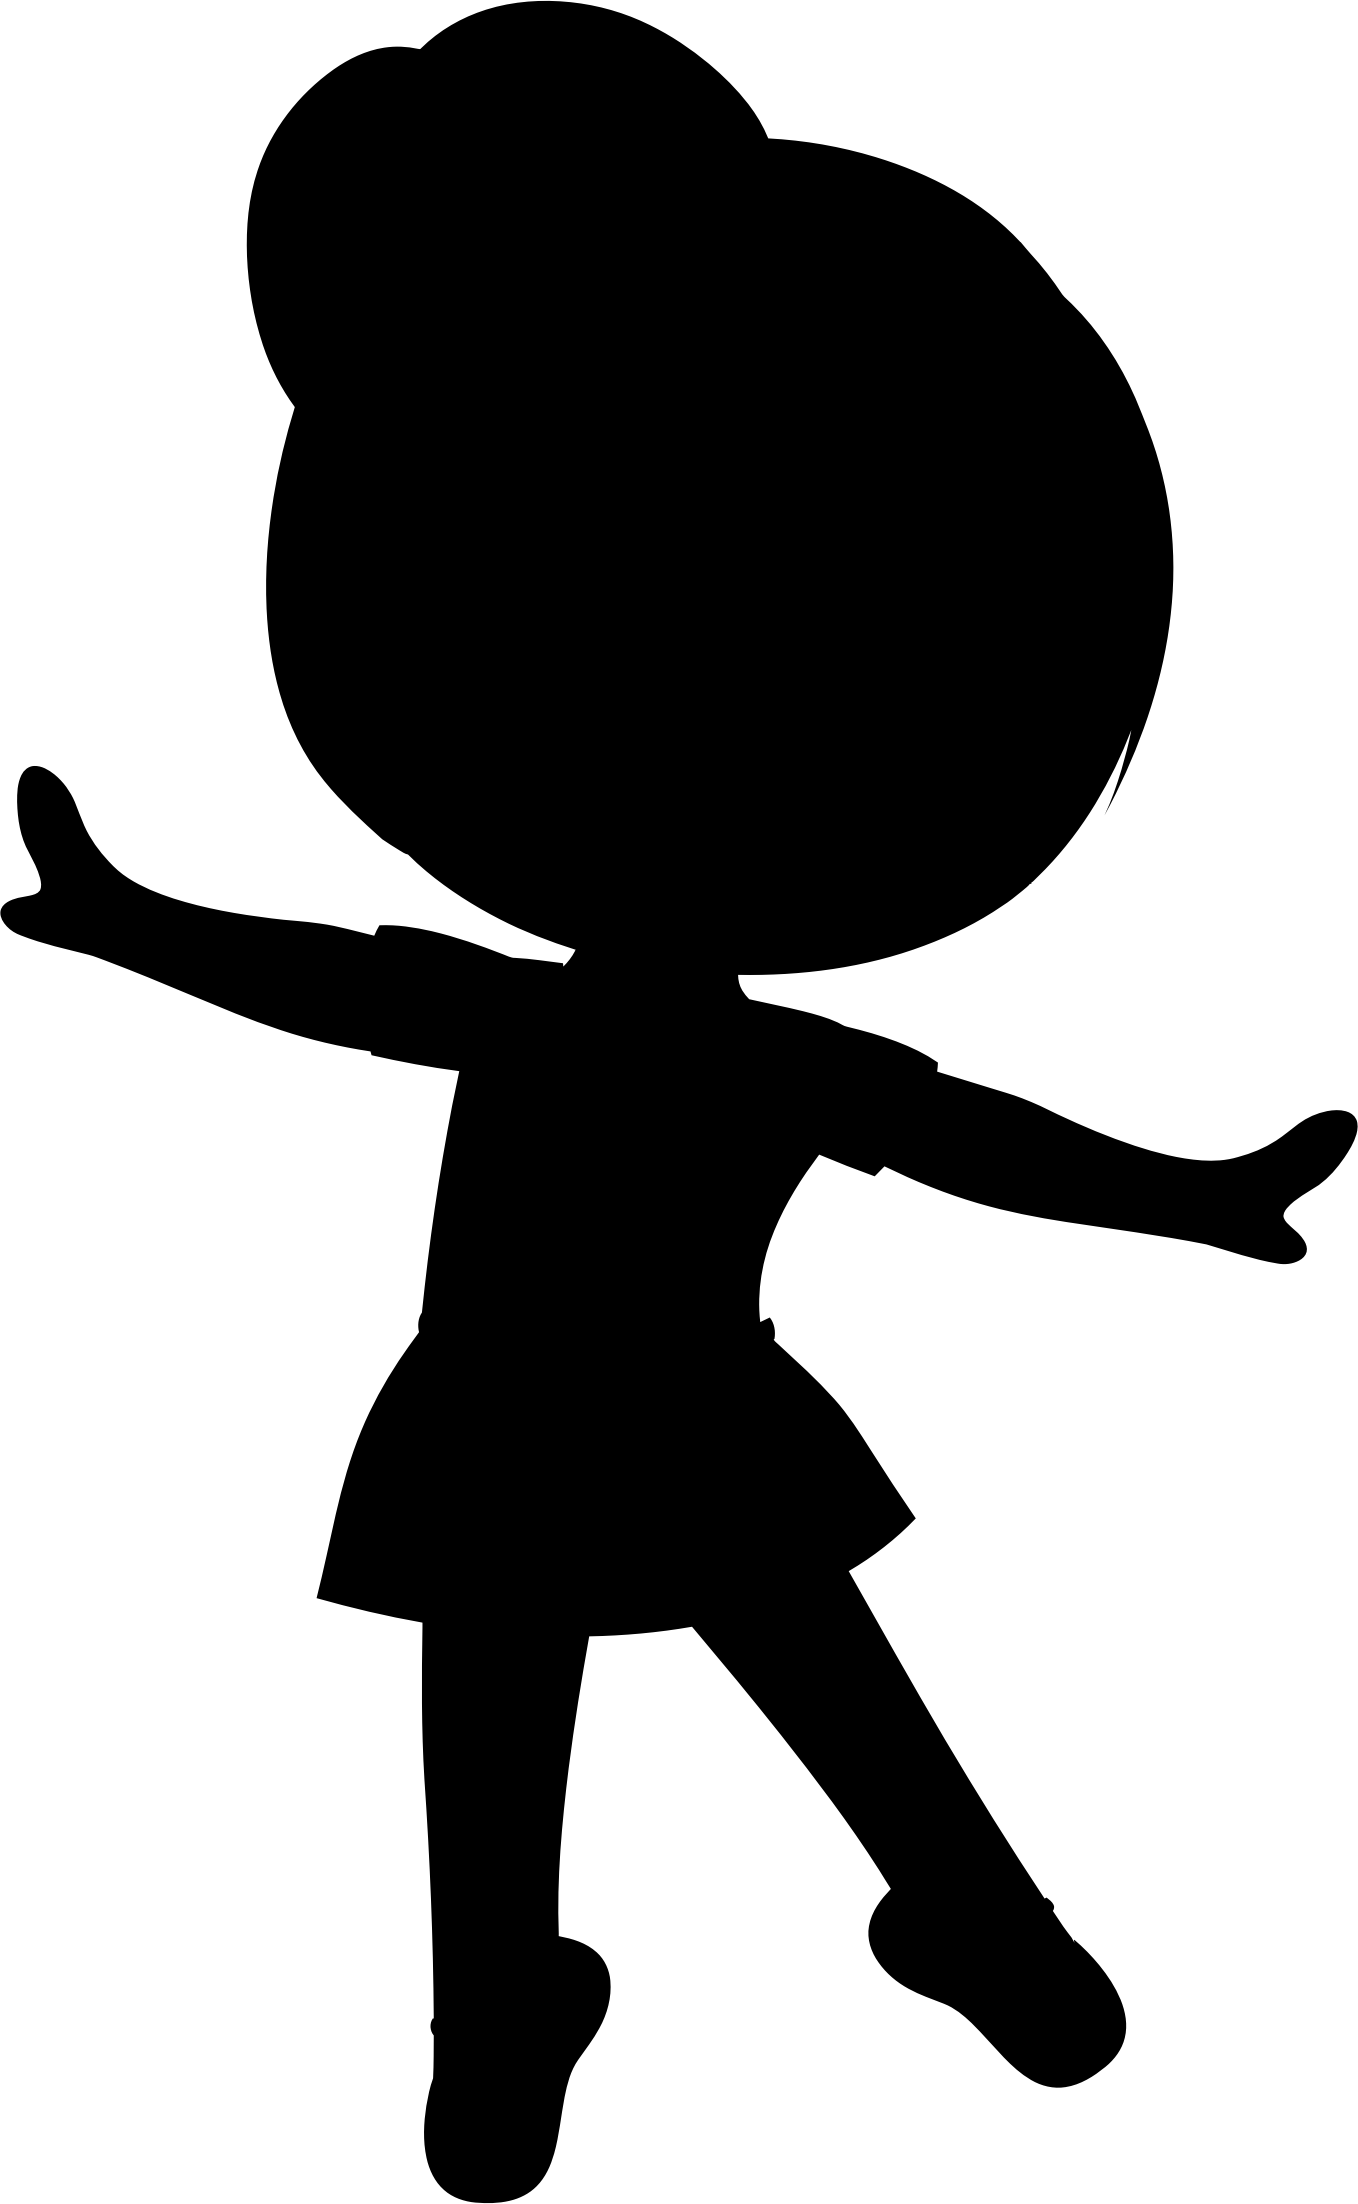 1358x2204 Clip Art Ballet Silhouette Clip Art